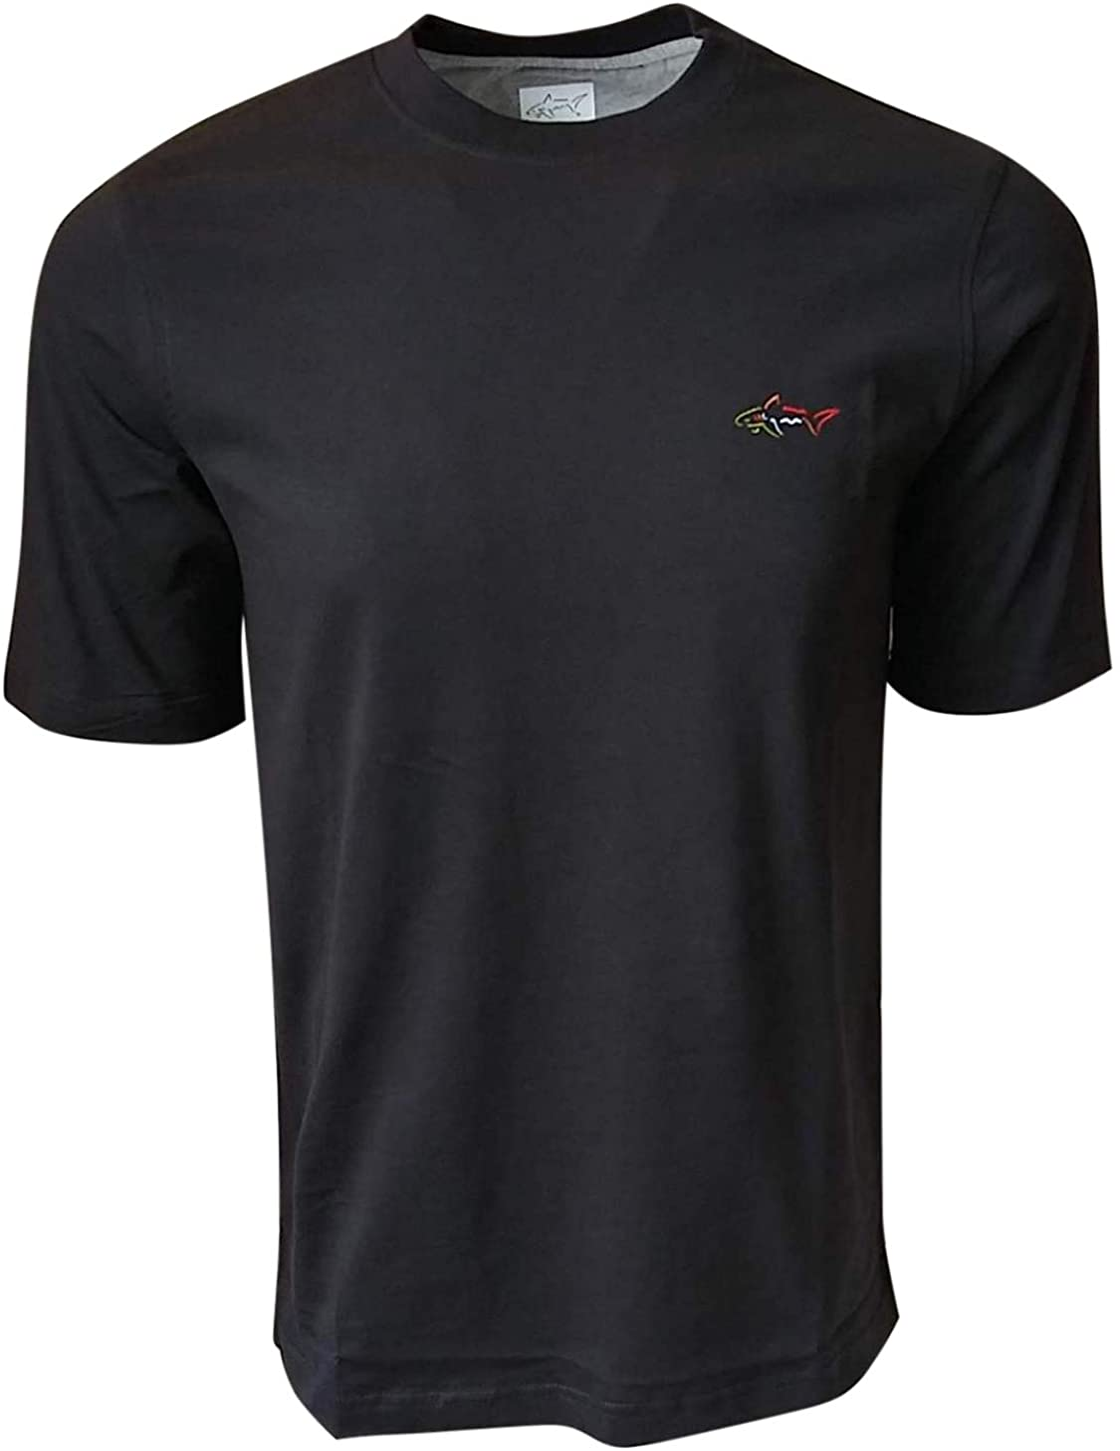 Greg Norman Men's Crew-Neck T-Shirt